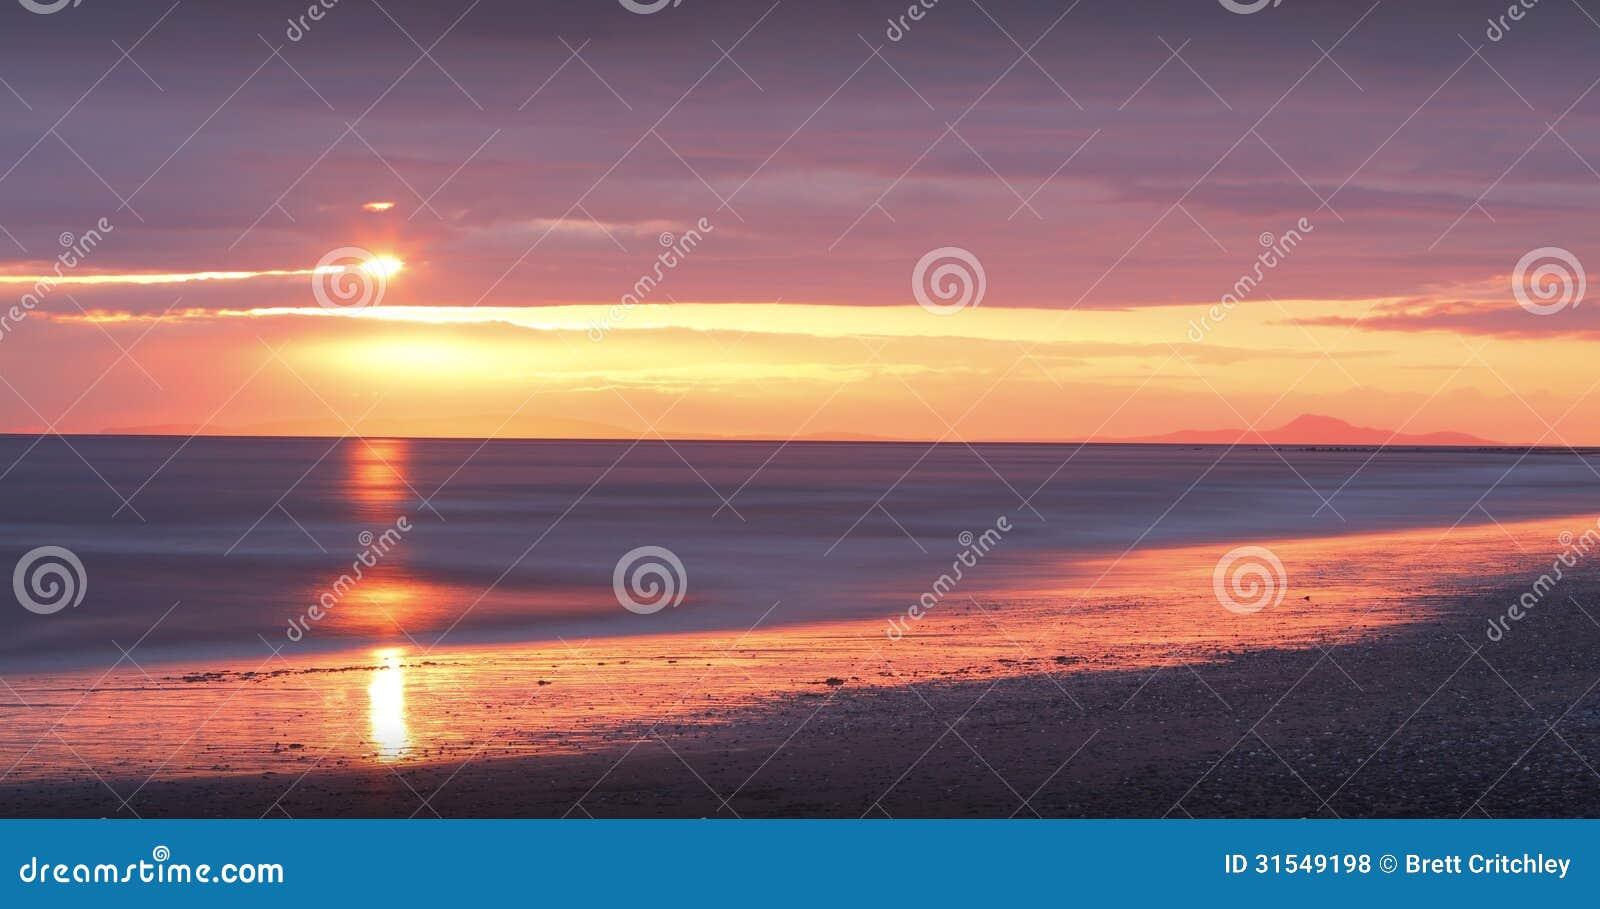 Goldener Sonnenuntergang auf Strand